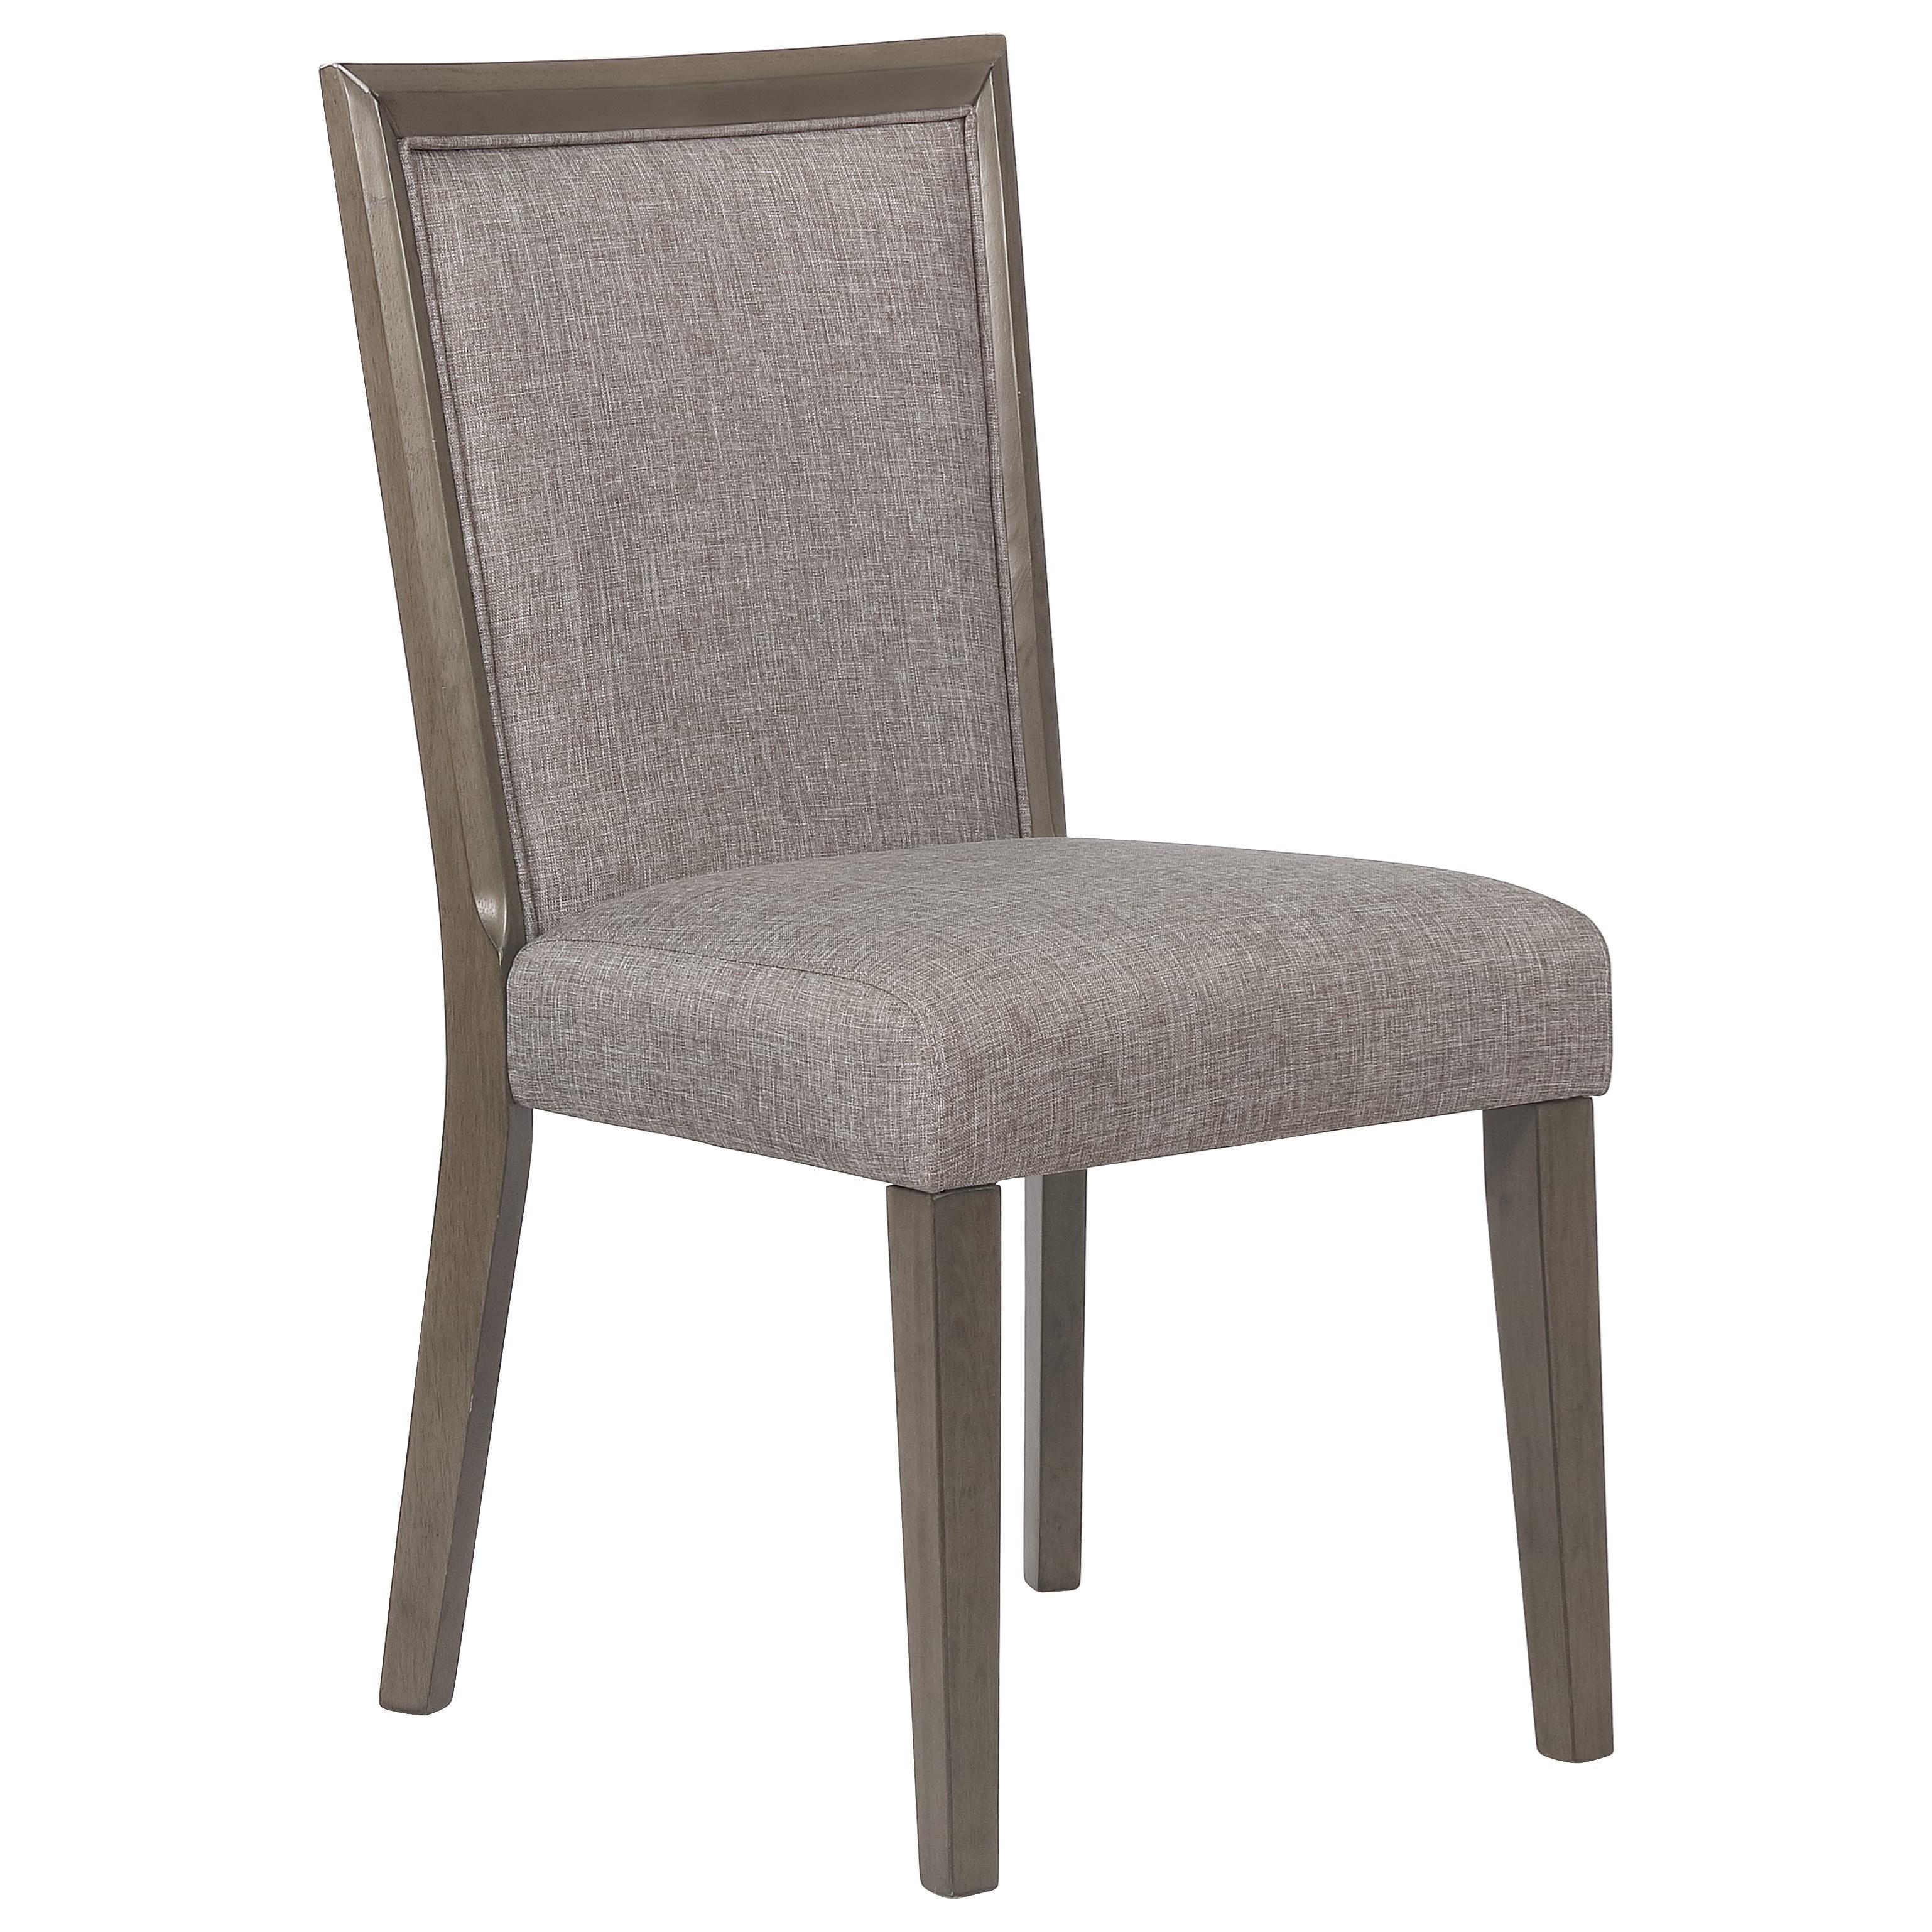 Primm Primm Side Chair by Powell at Bullard Furniture